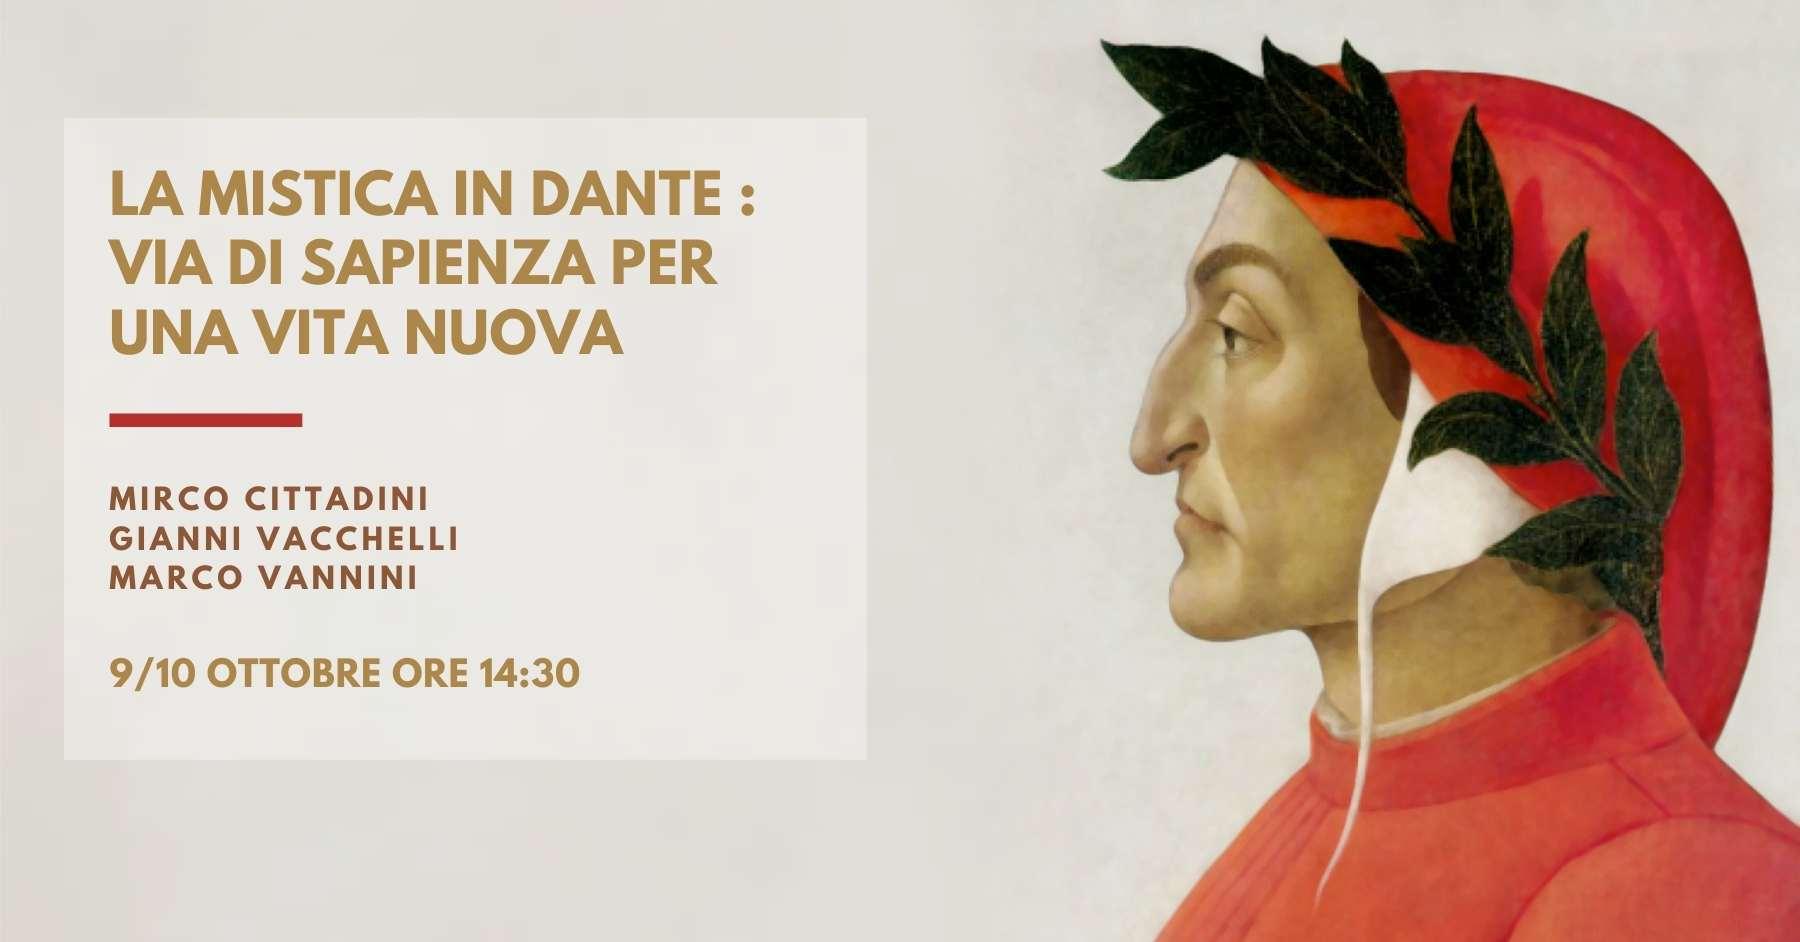 Cittadini-Vacchelli-Vannini - Dante